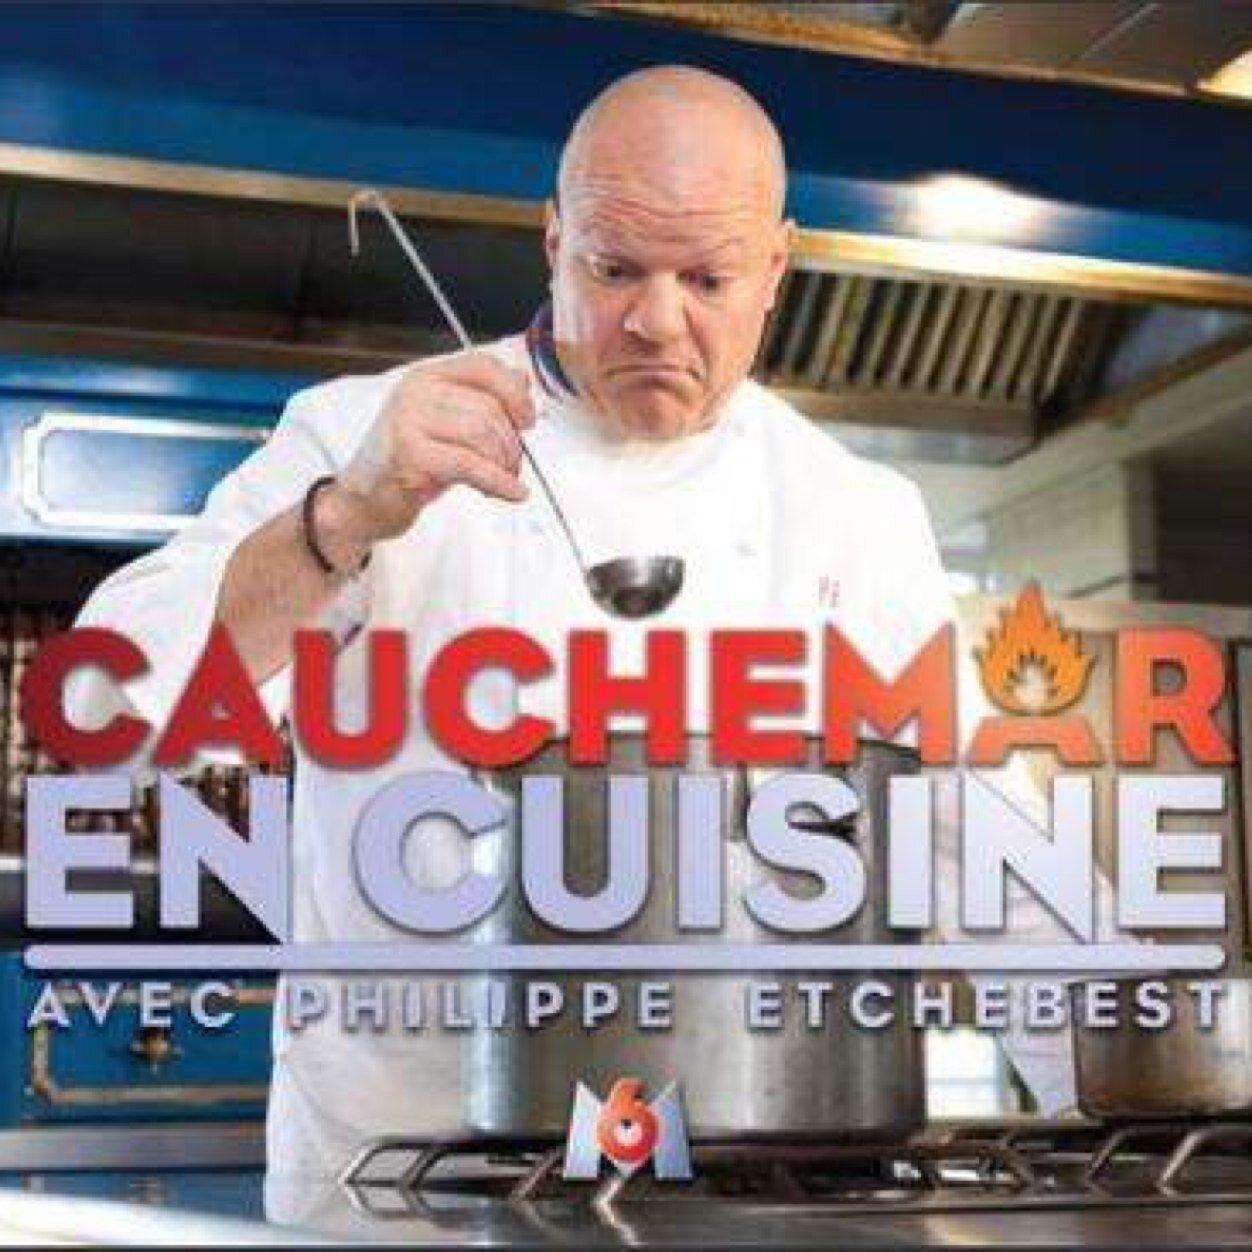 Cauchemar en cuisine cauchencuis twitter - Cauchemars en cuisine ...